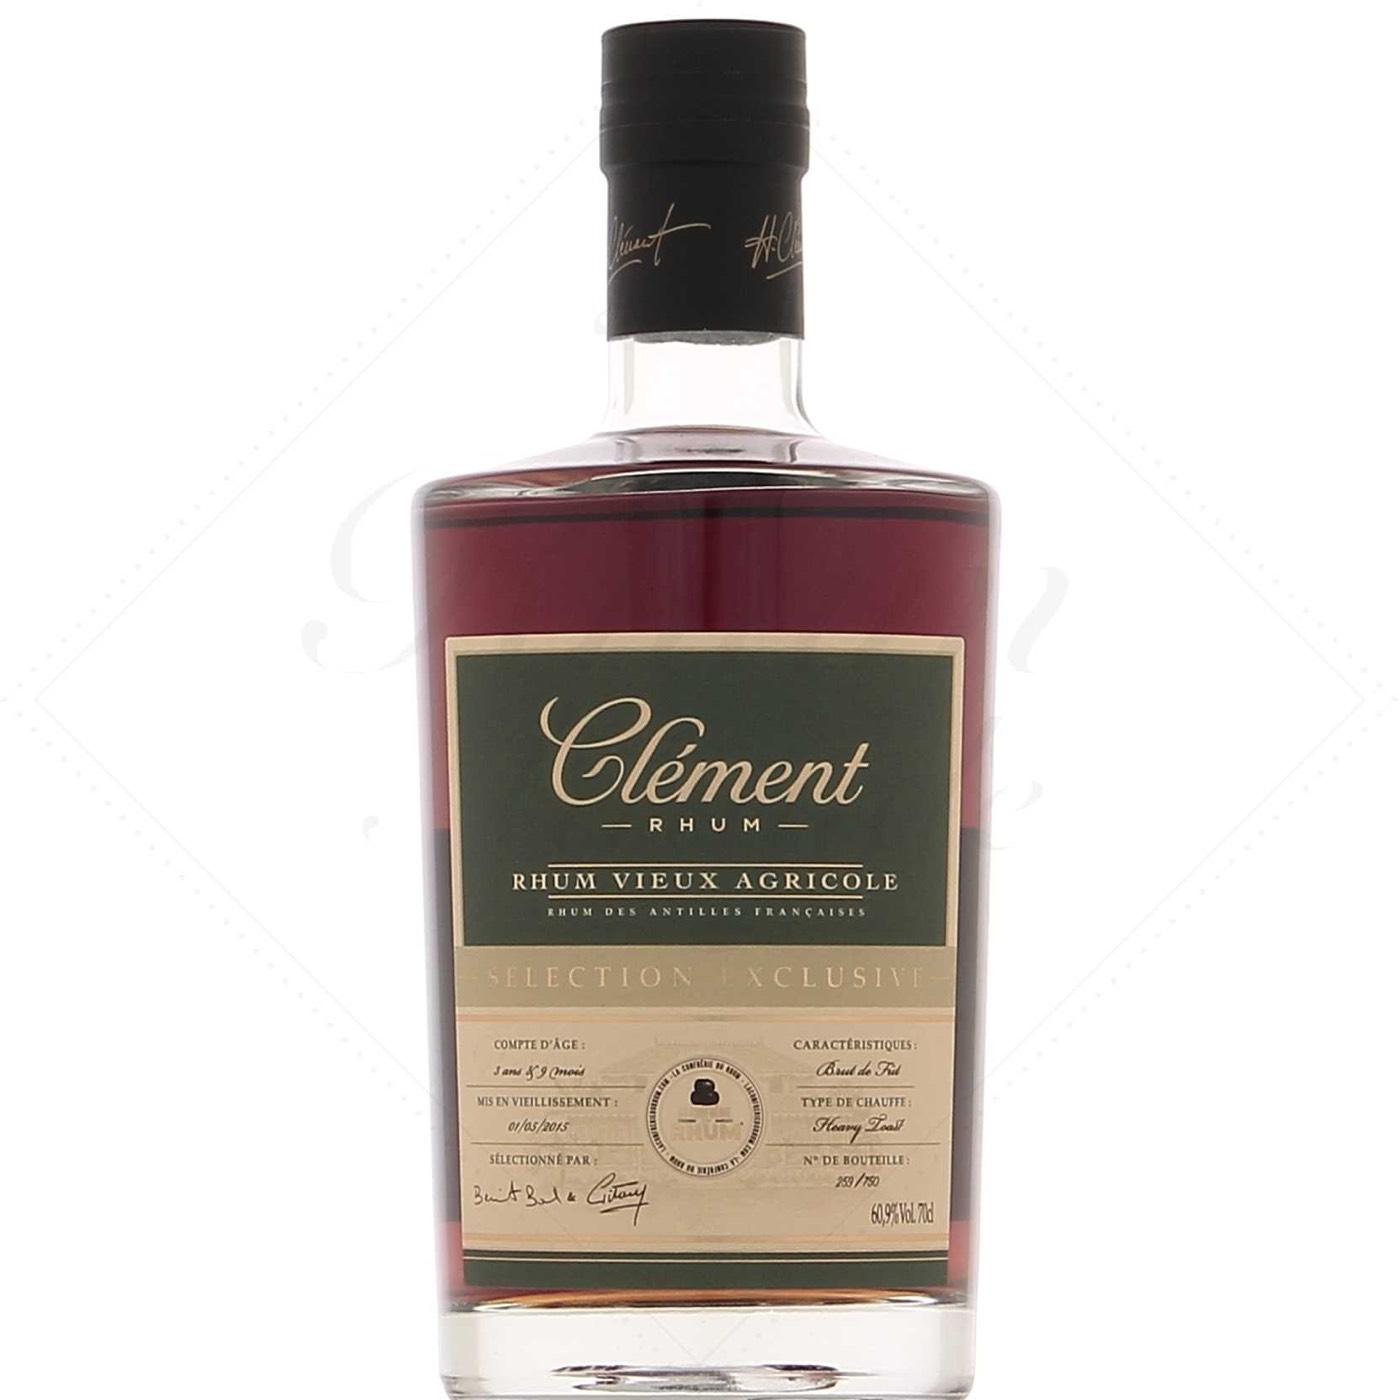 Bottle image of Clément Selection Exclusive